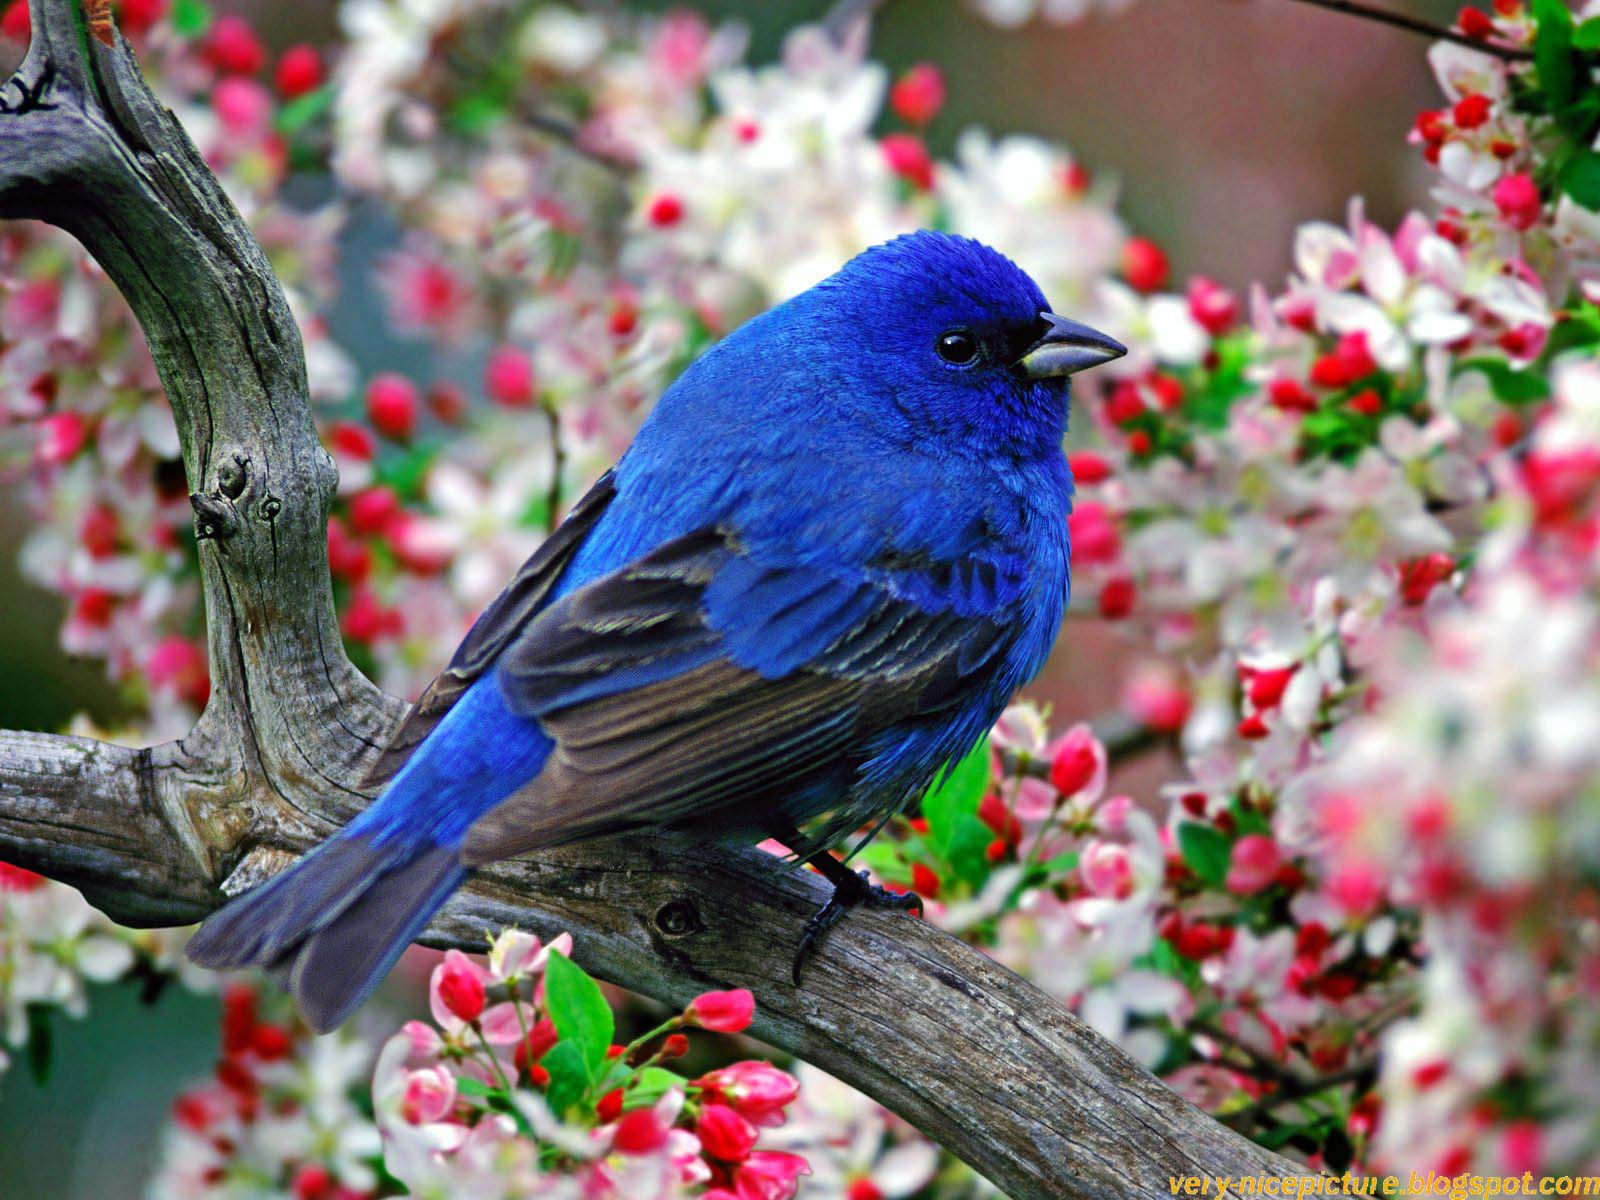 Wallpapers Beautiful Birds birds wallpapers Natural Wallpapers 1600x1200